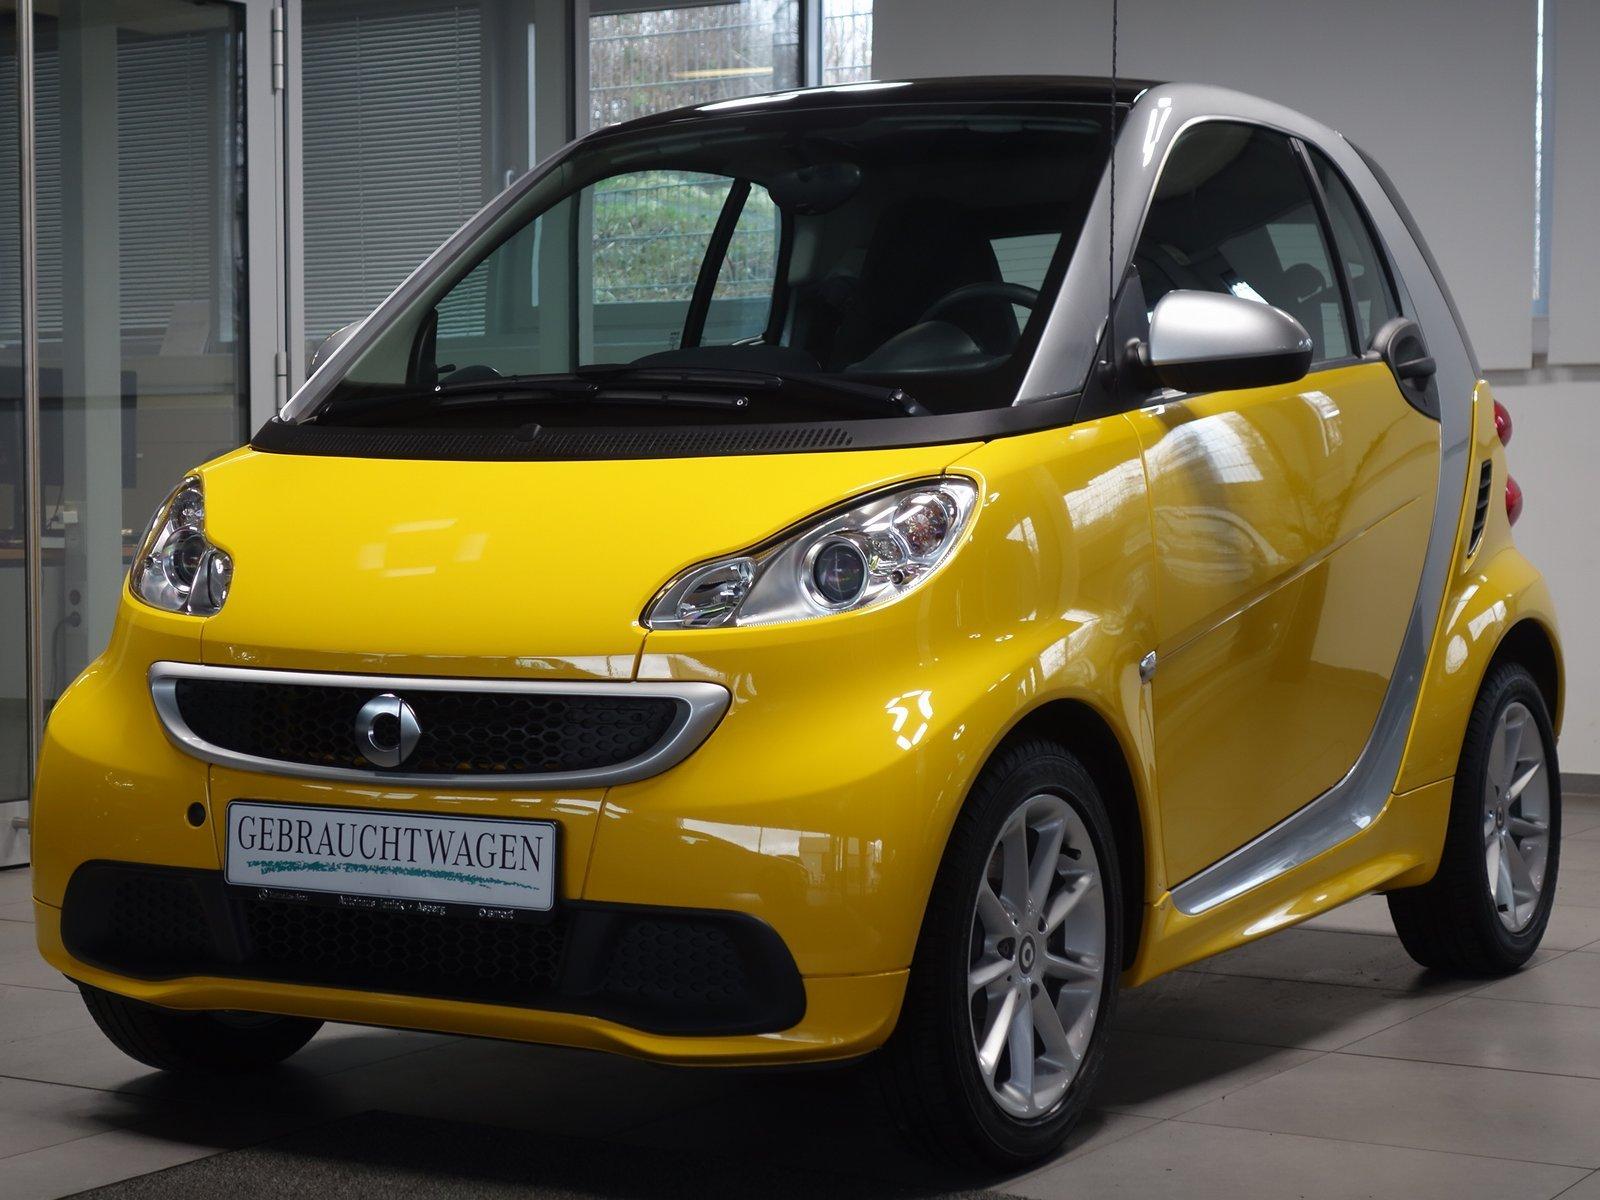 smart fortwo coupe mhd Passion|Klima|Sitzh., Jahr 2014, Benzin